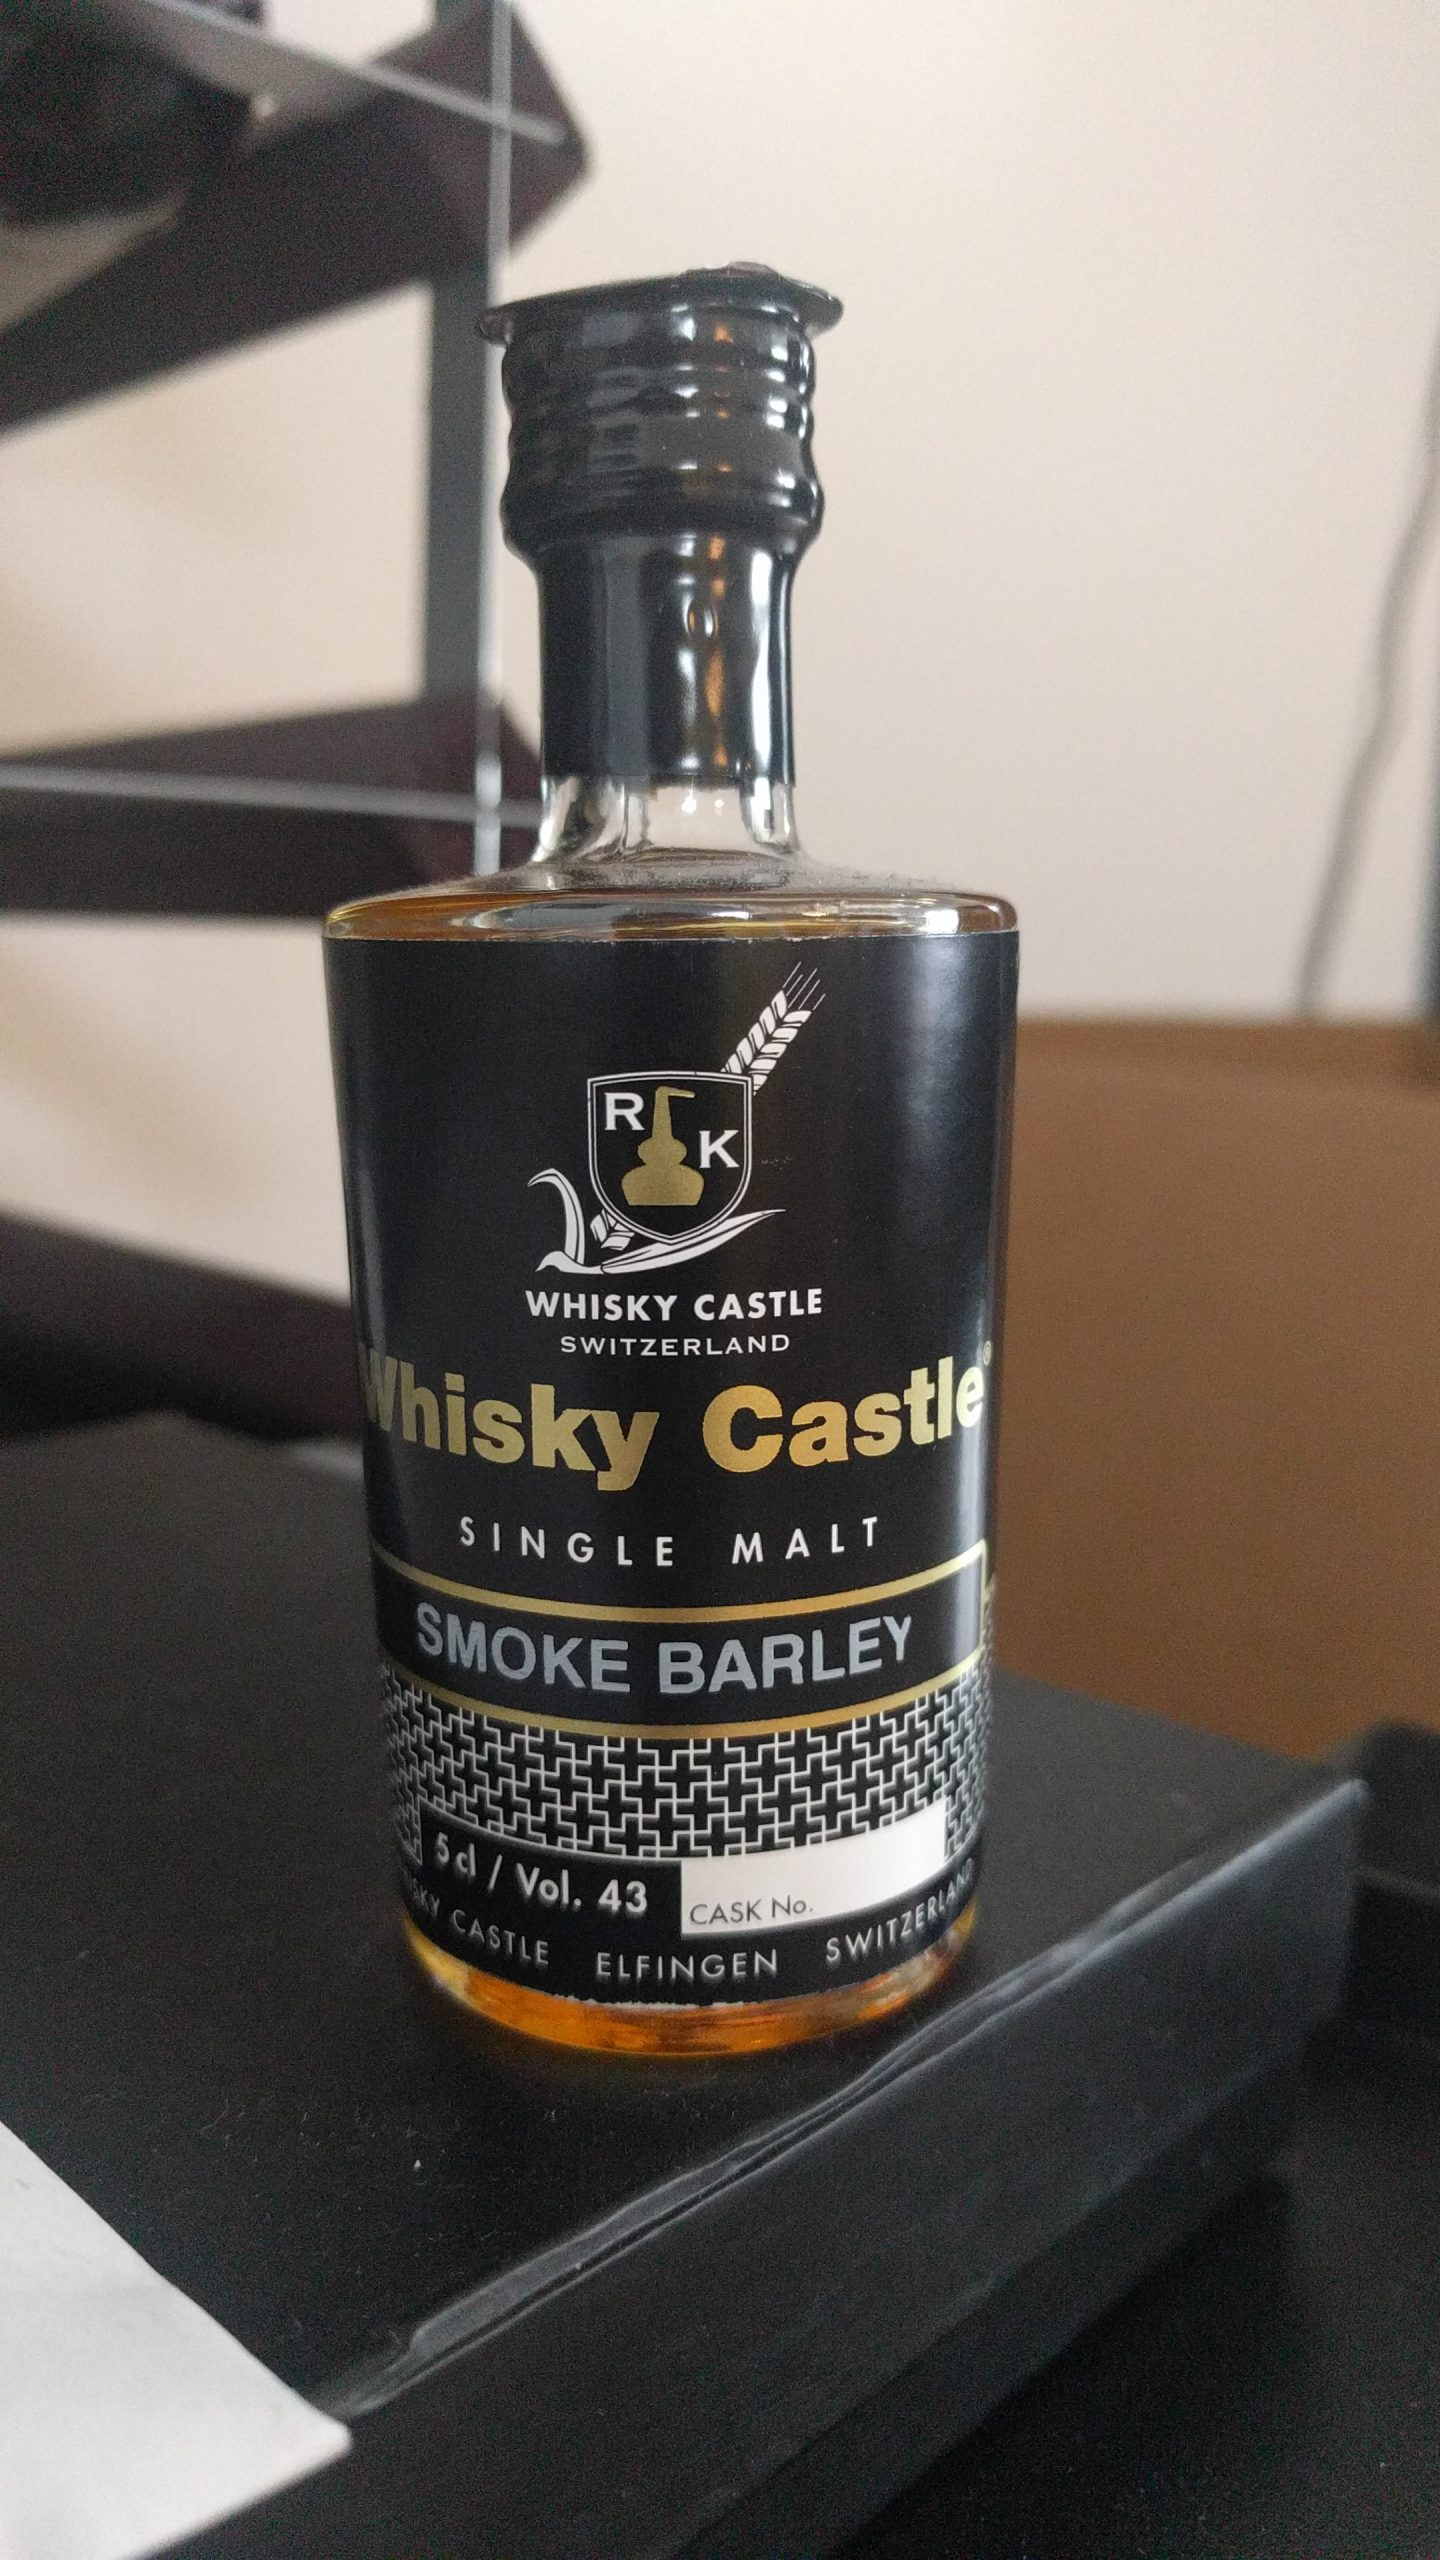 Whisky Castle Smoke Barley